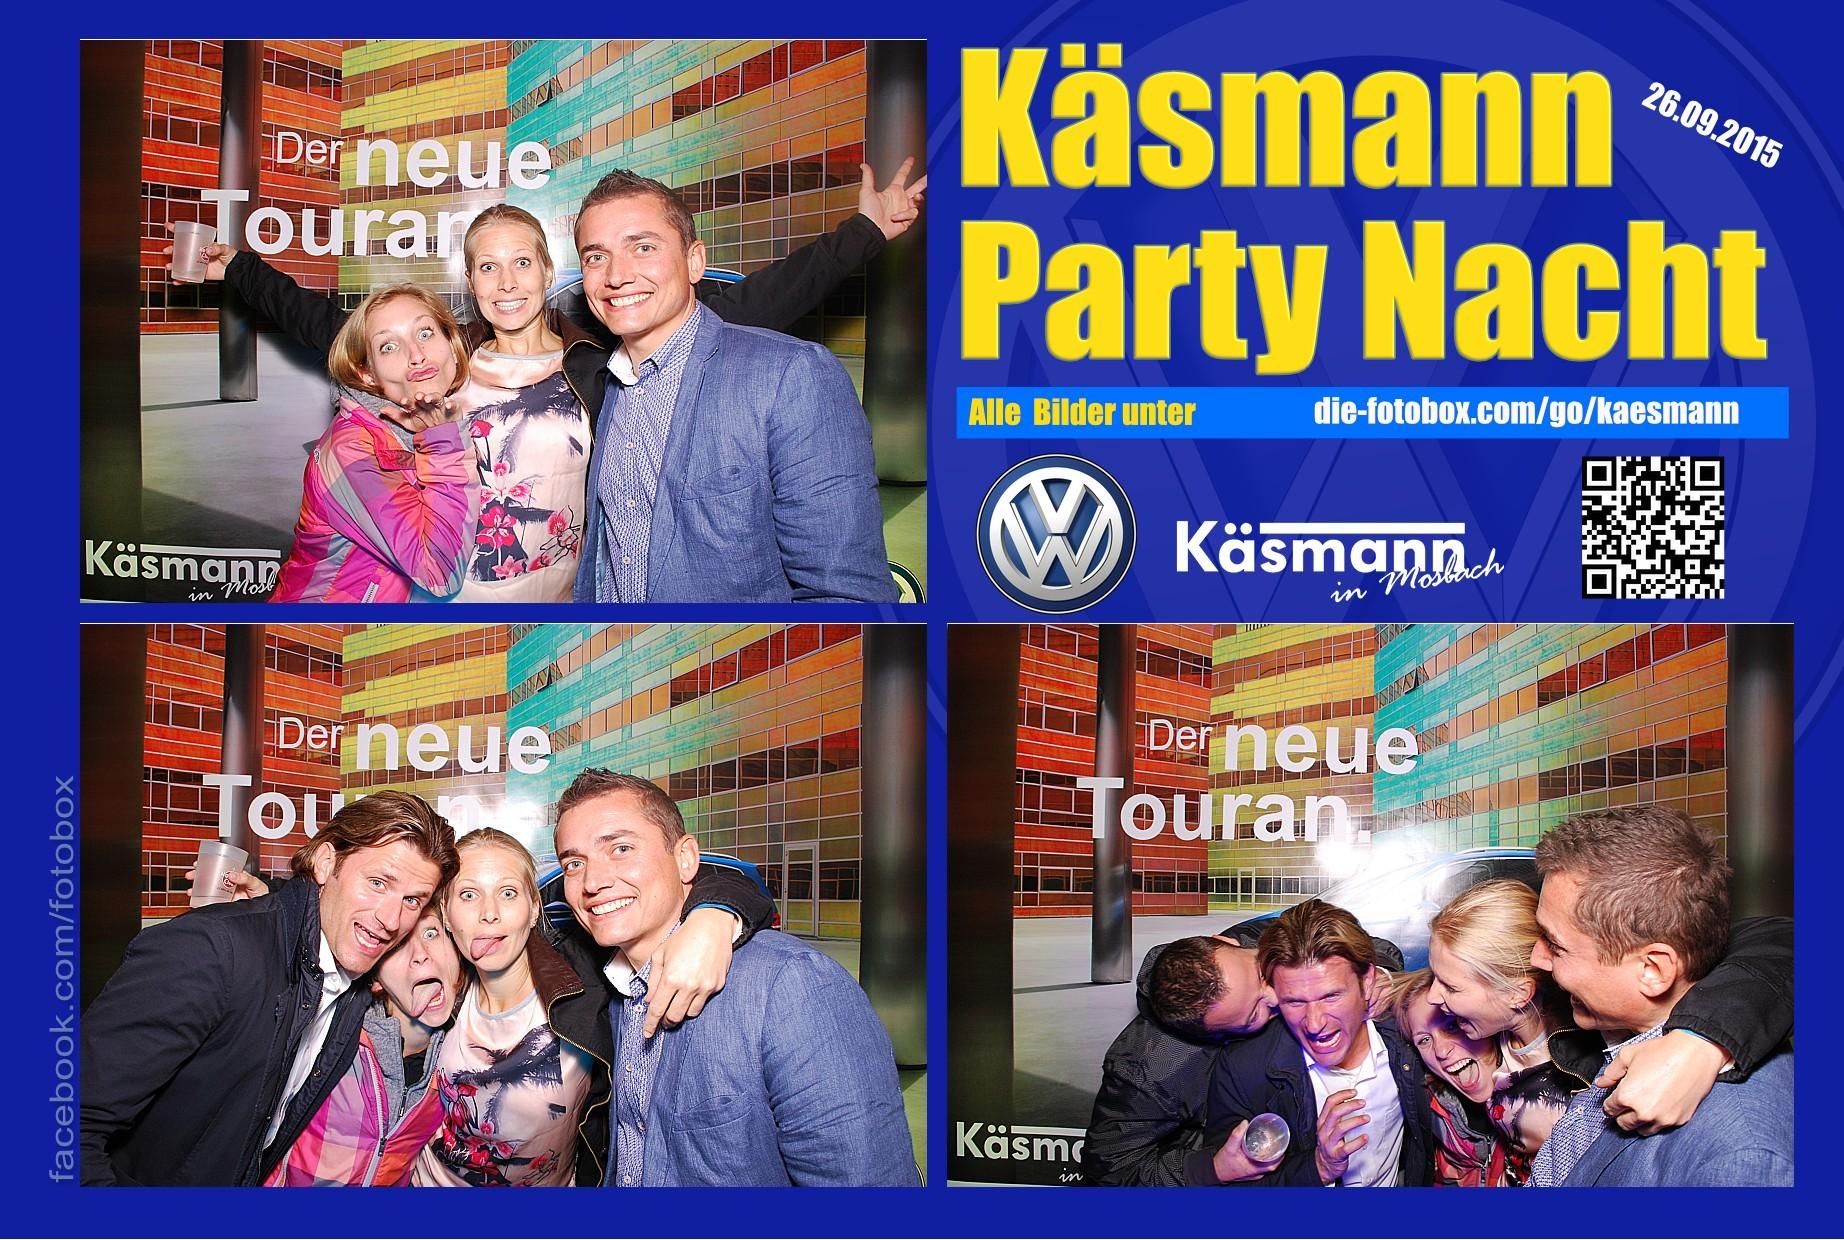 Käsmannparty 2015 - www.die-fotobox.com 01275